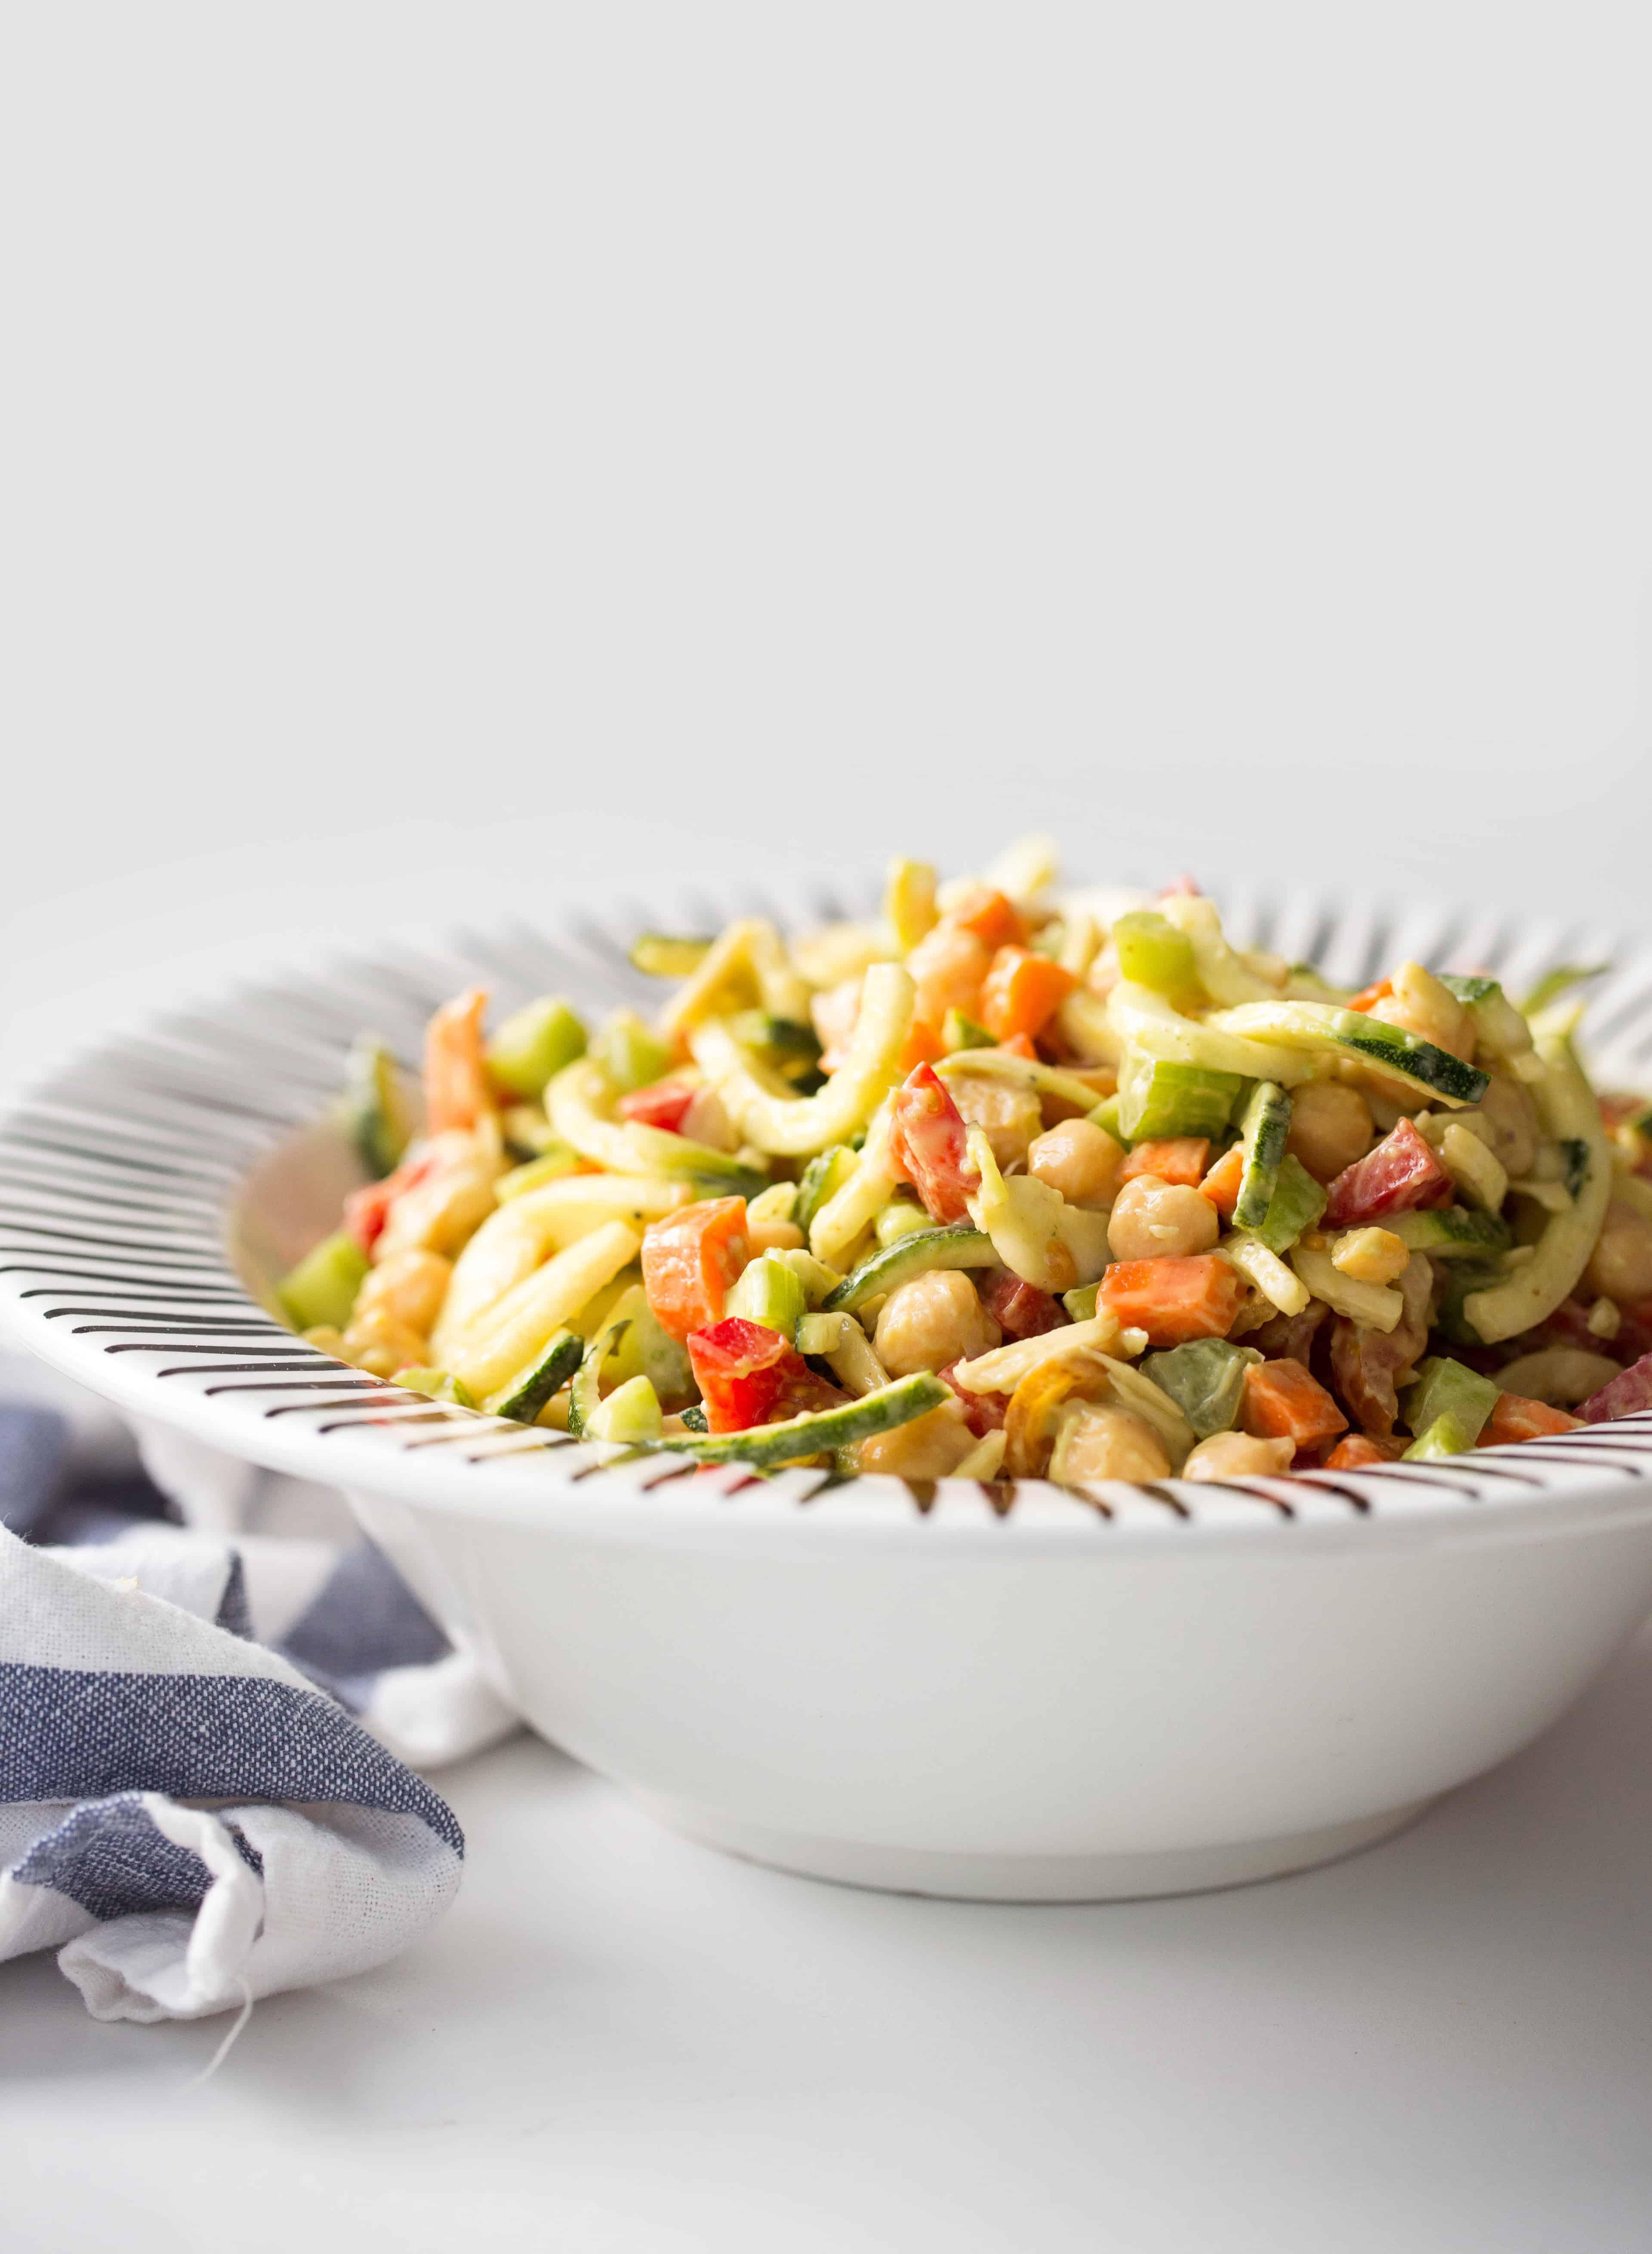 Chopped Zucchini Pasta Salad with Avocado-Mustard Dressing